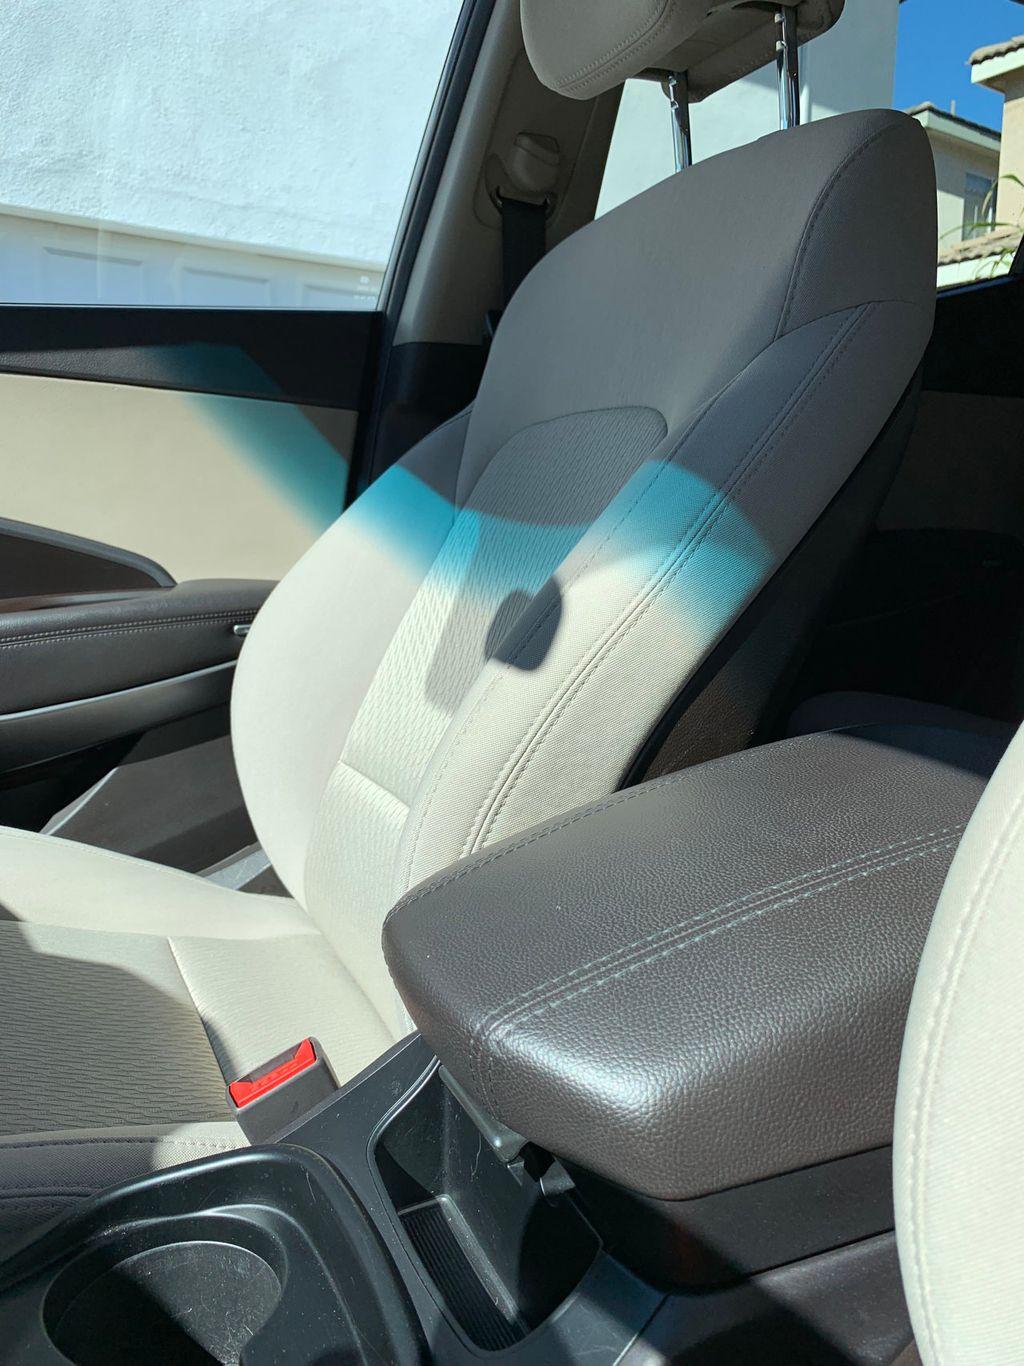 2017 Hyundai Santa Fe Sport 2.4L Automatic - 18574995 - 26